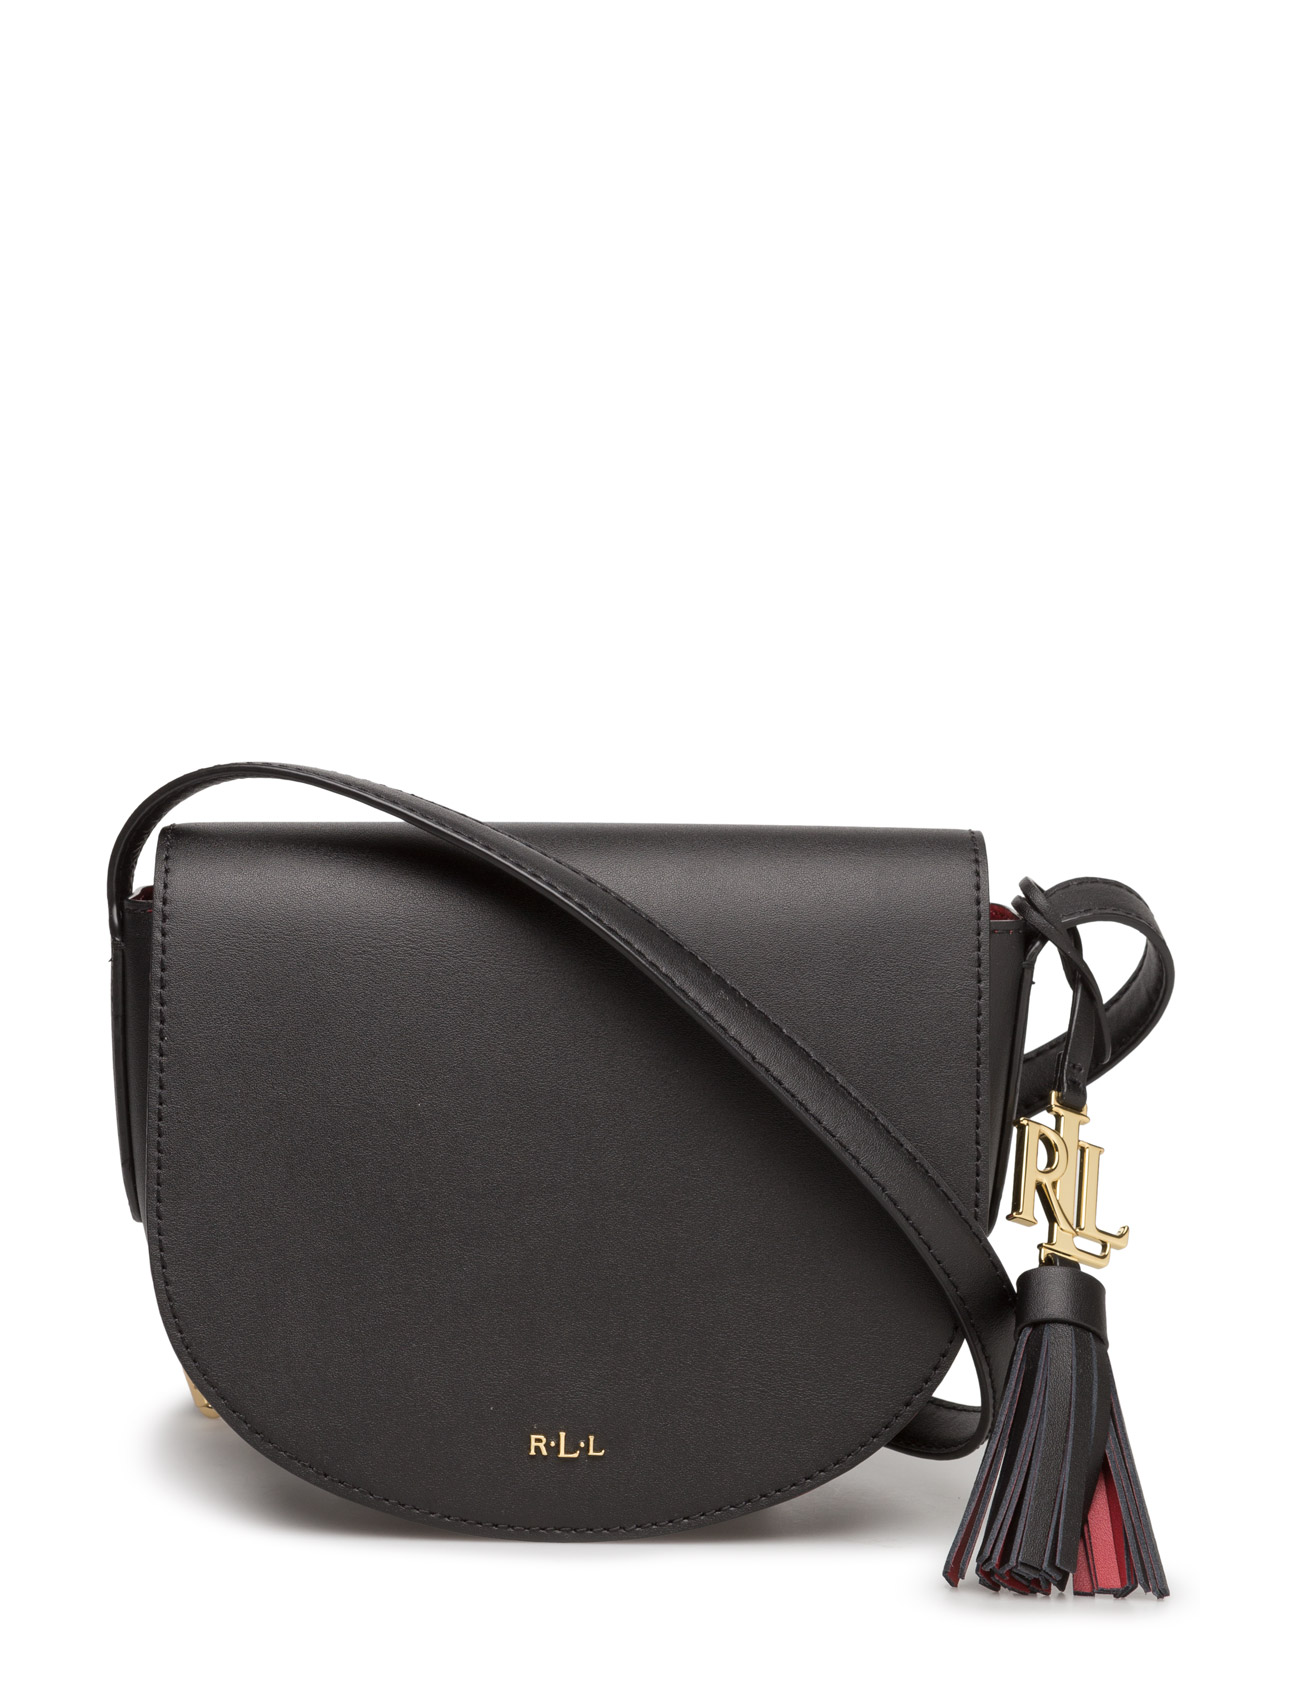 Lauren Ralph Lauren Leather Mini Caley Saddle Bag